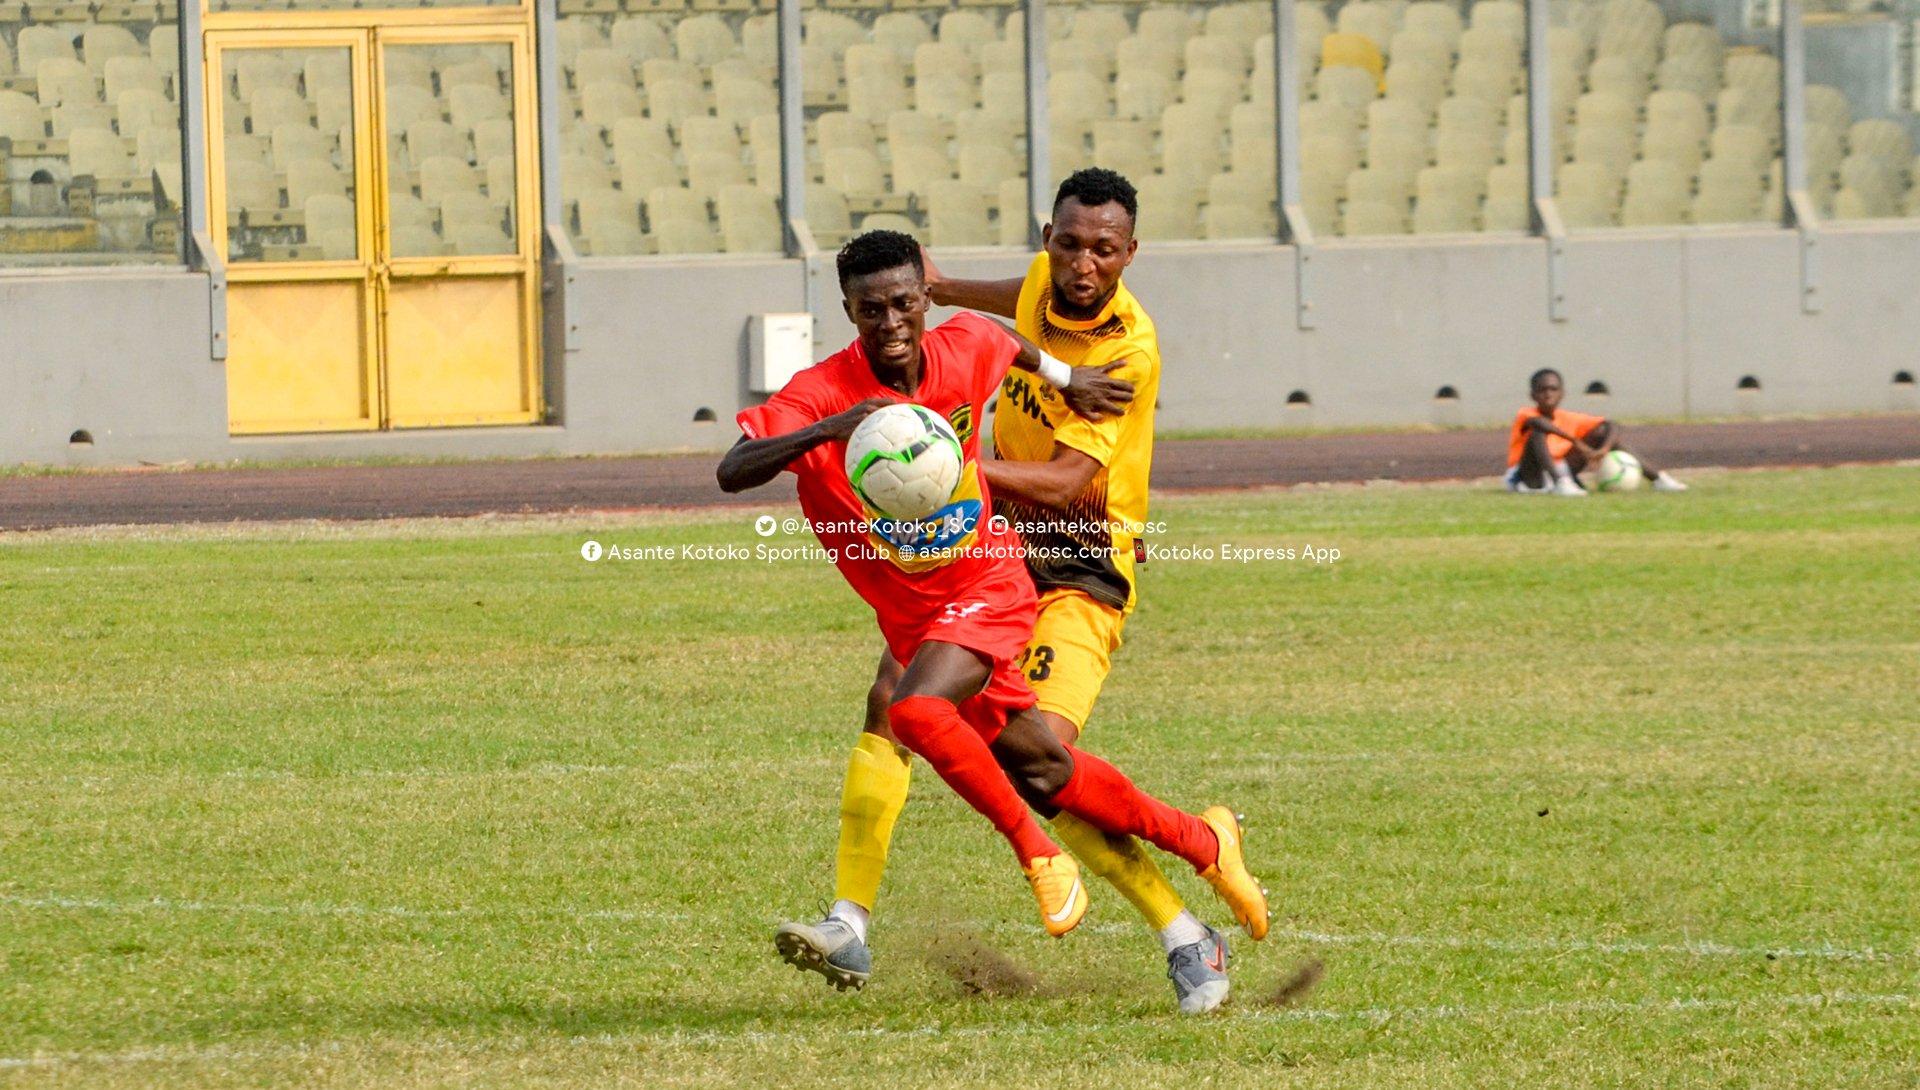 GPL week 10 review: AshGold, Kotoko top the league, Hearts beat Bechem, Liberty stun Aduana in a seven goal thriller